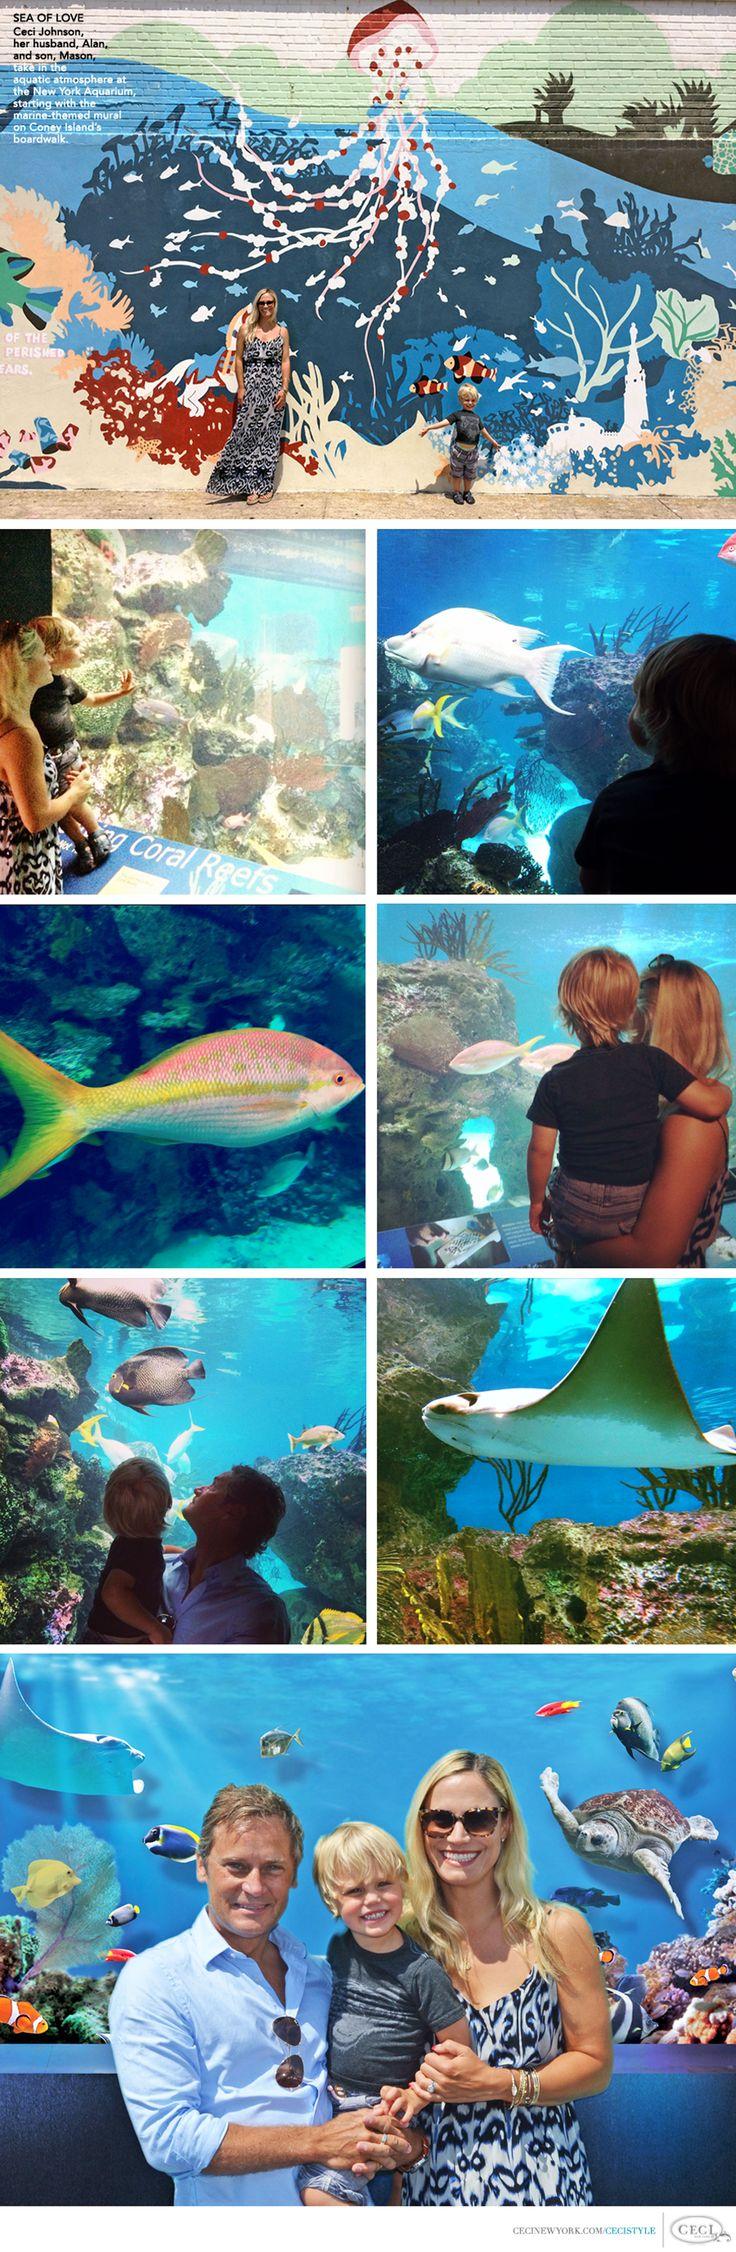 Best 25 aquarium mural ideas on pinterest plongeur for Aquarium mural wallpaper